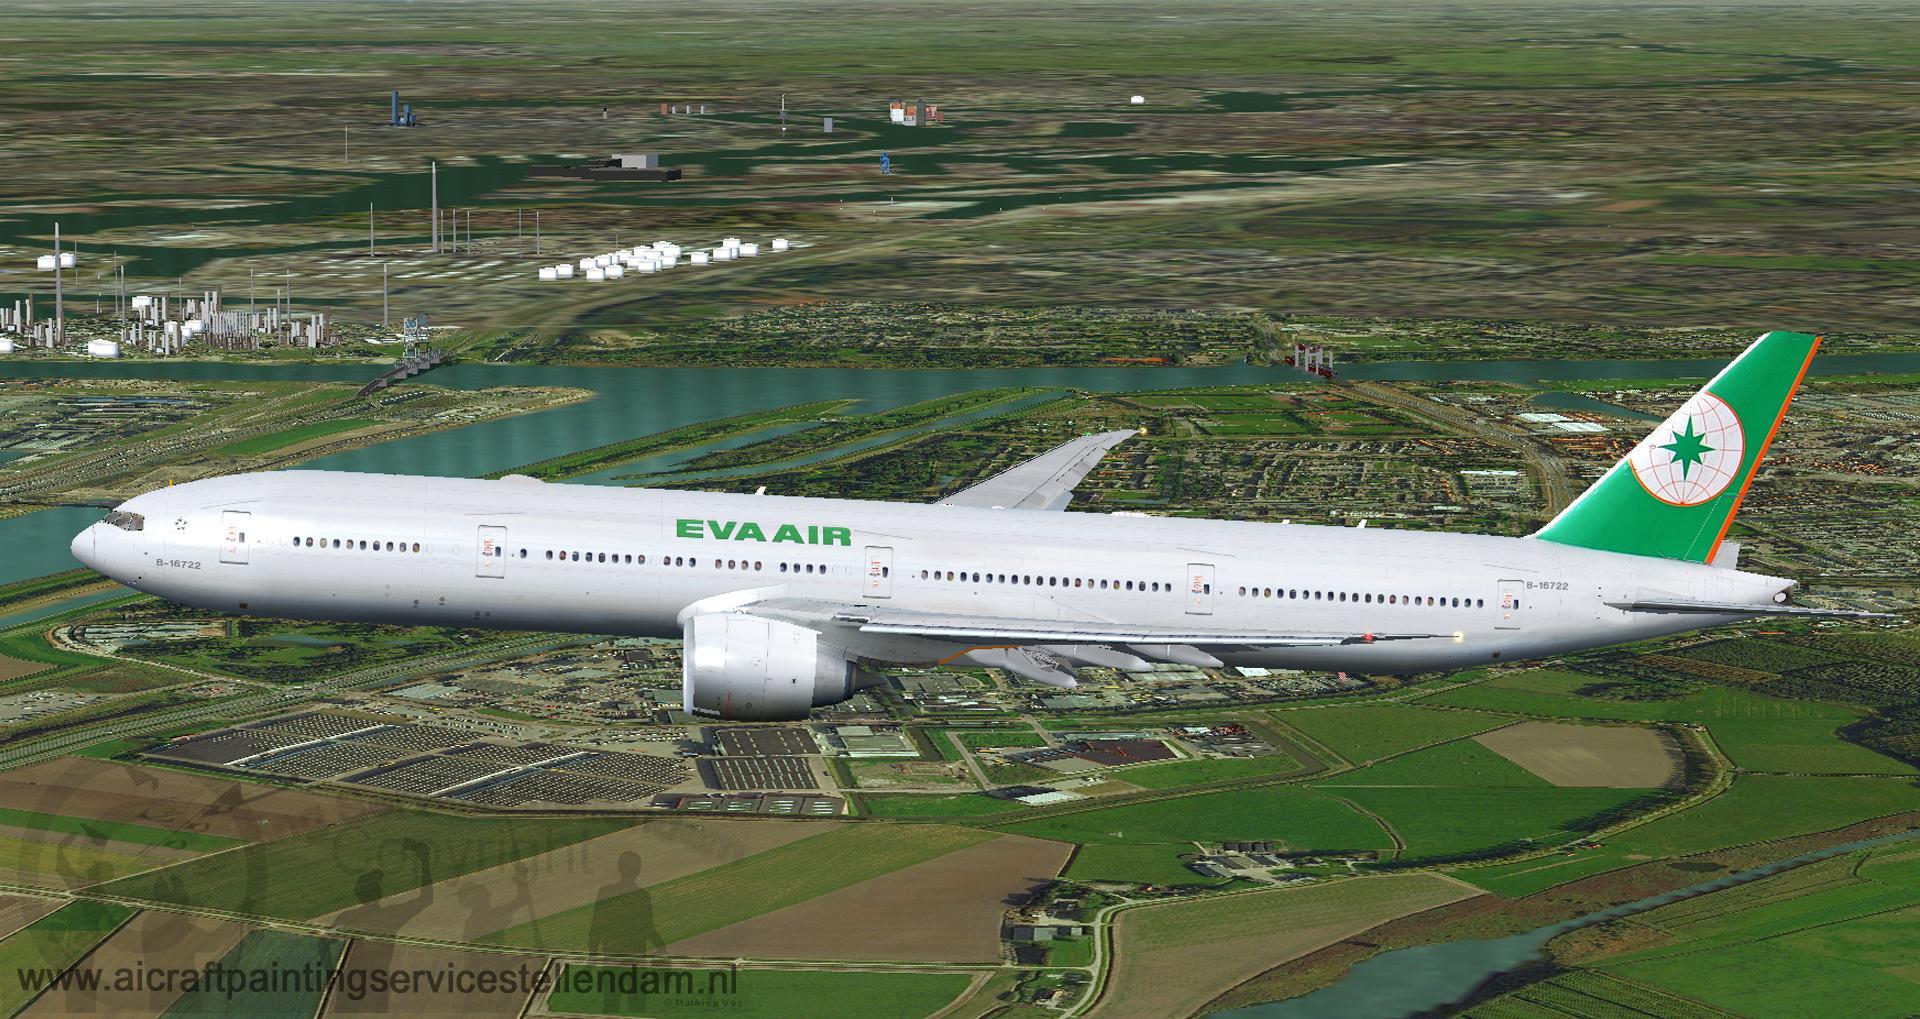 SkySpirit2012B777-36N(ER)EvaAirways_White_B-16722_5